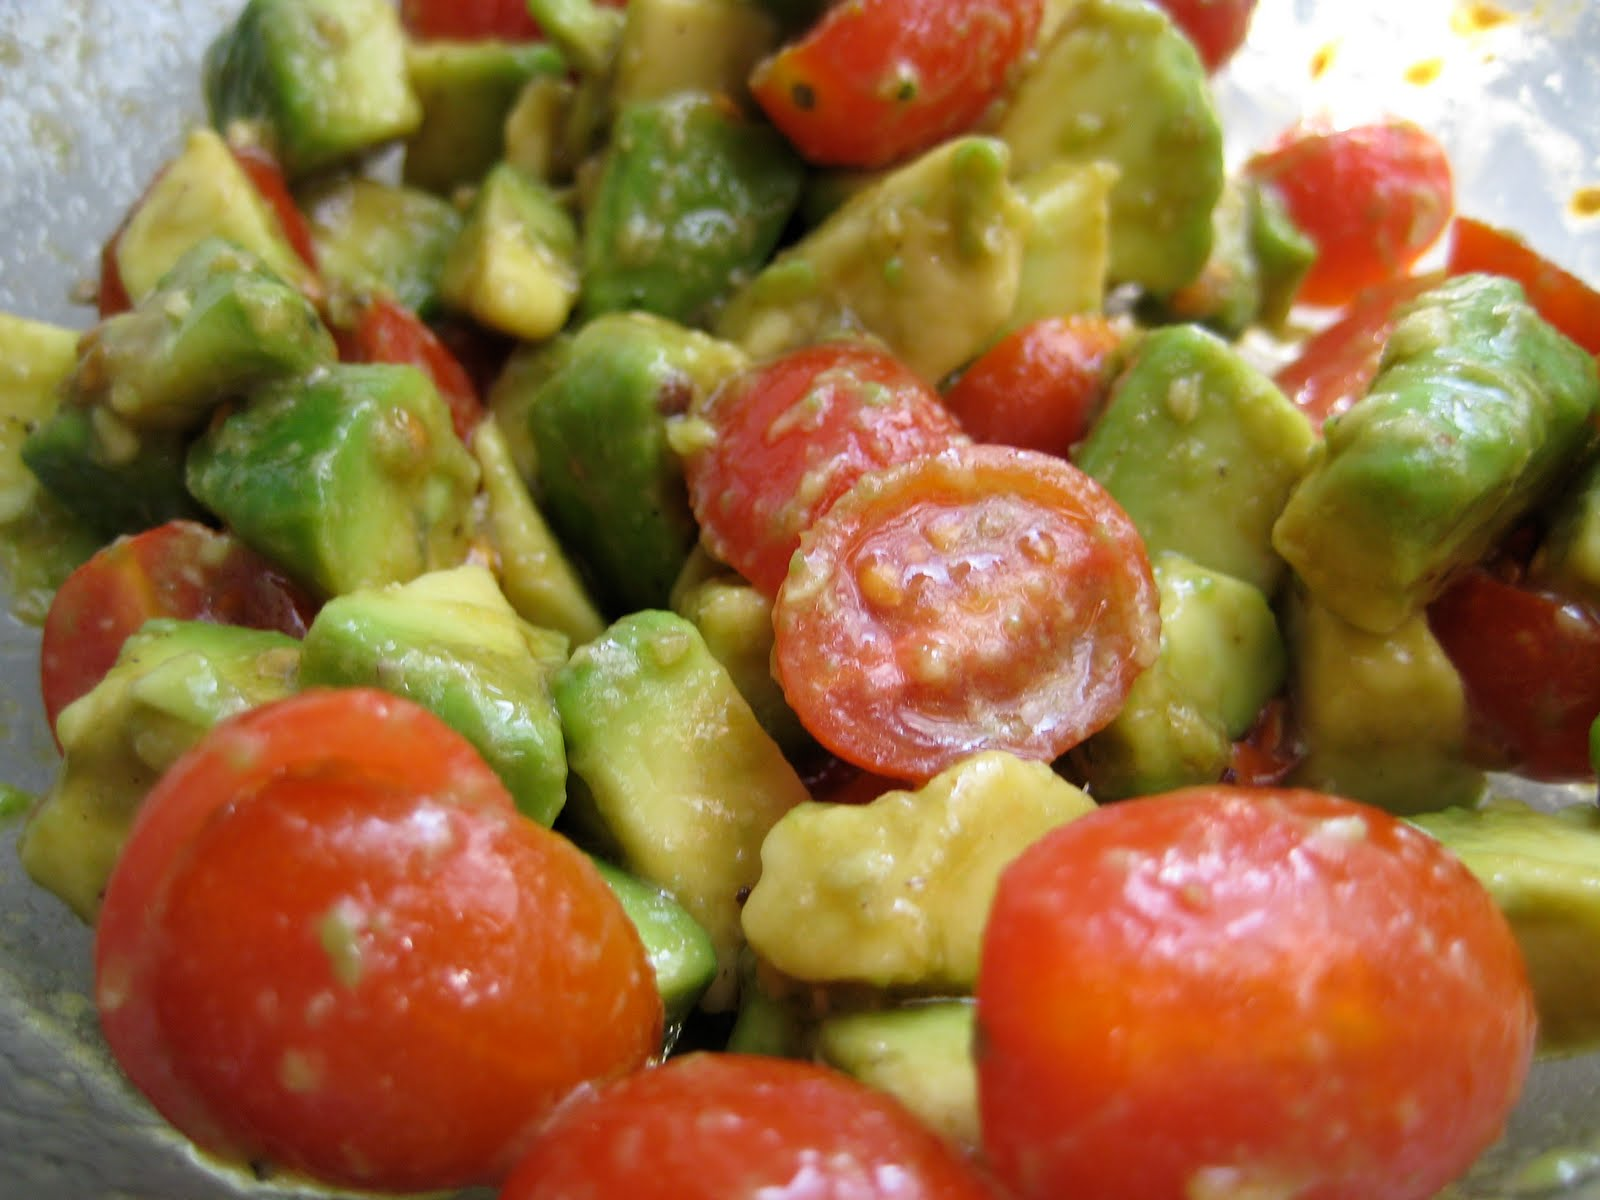 Avocado And Tomato Salad Recipes — Dishmaps